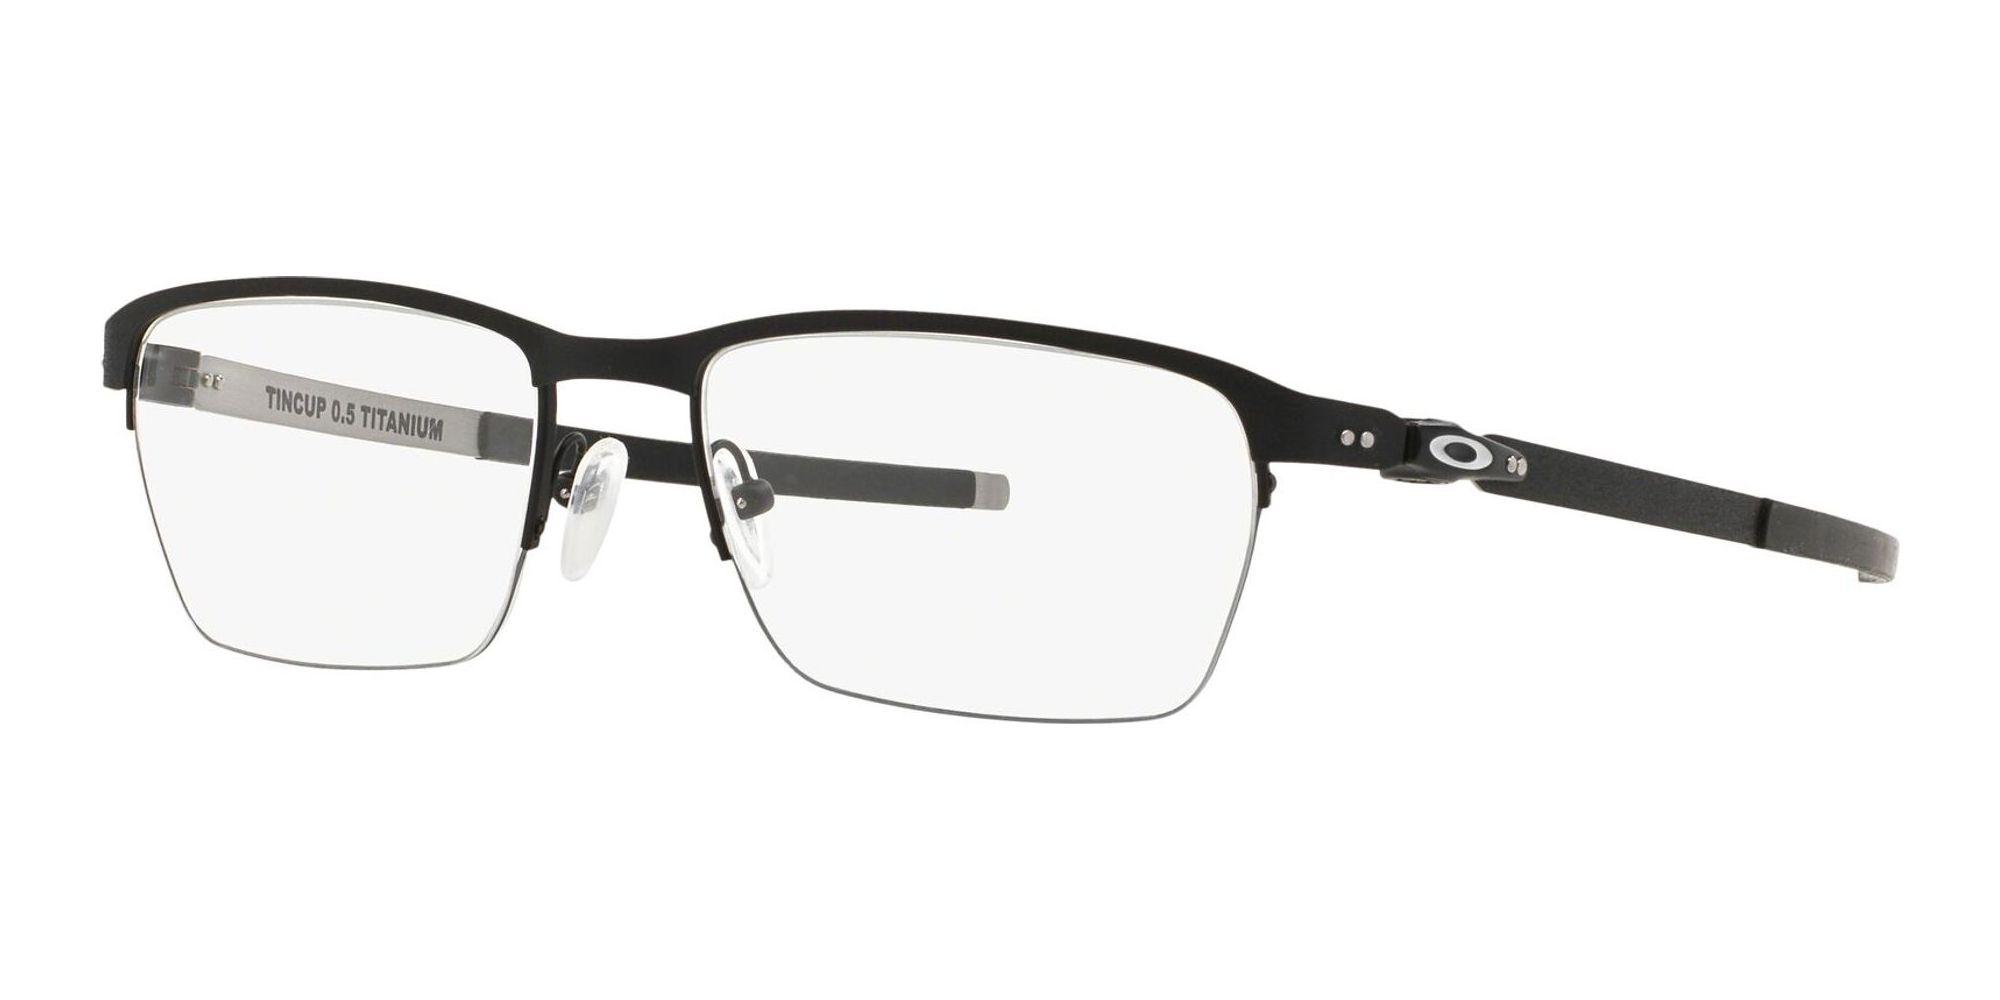 Oakley eyeglasses TINCUP 0.5 TITANIUM OX 5099